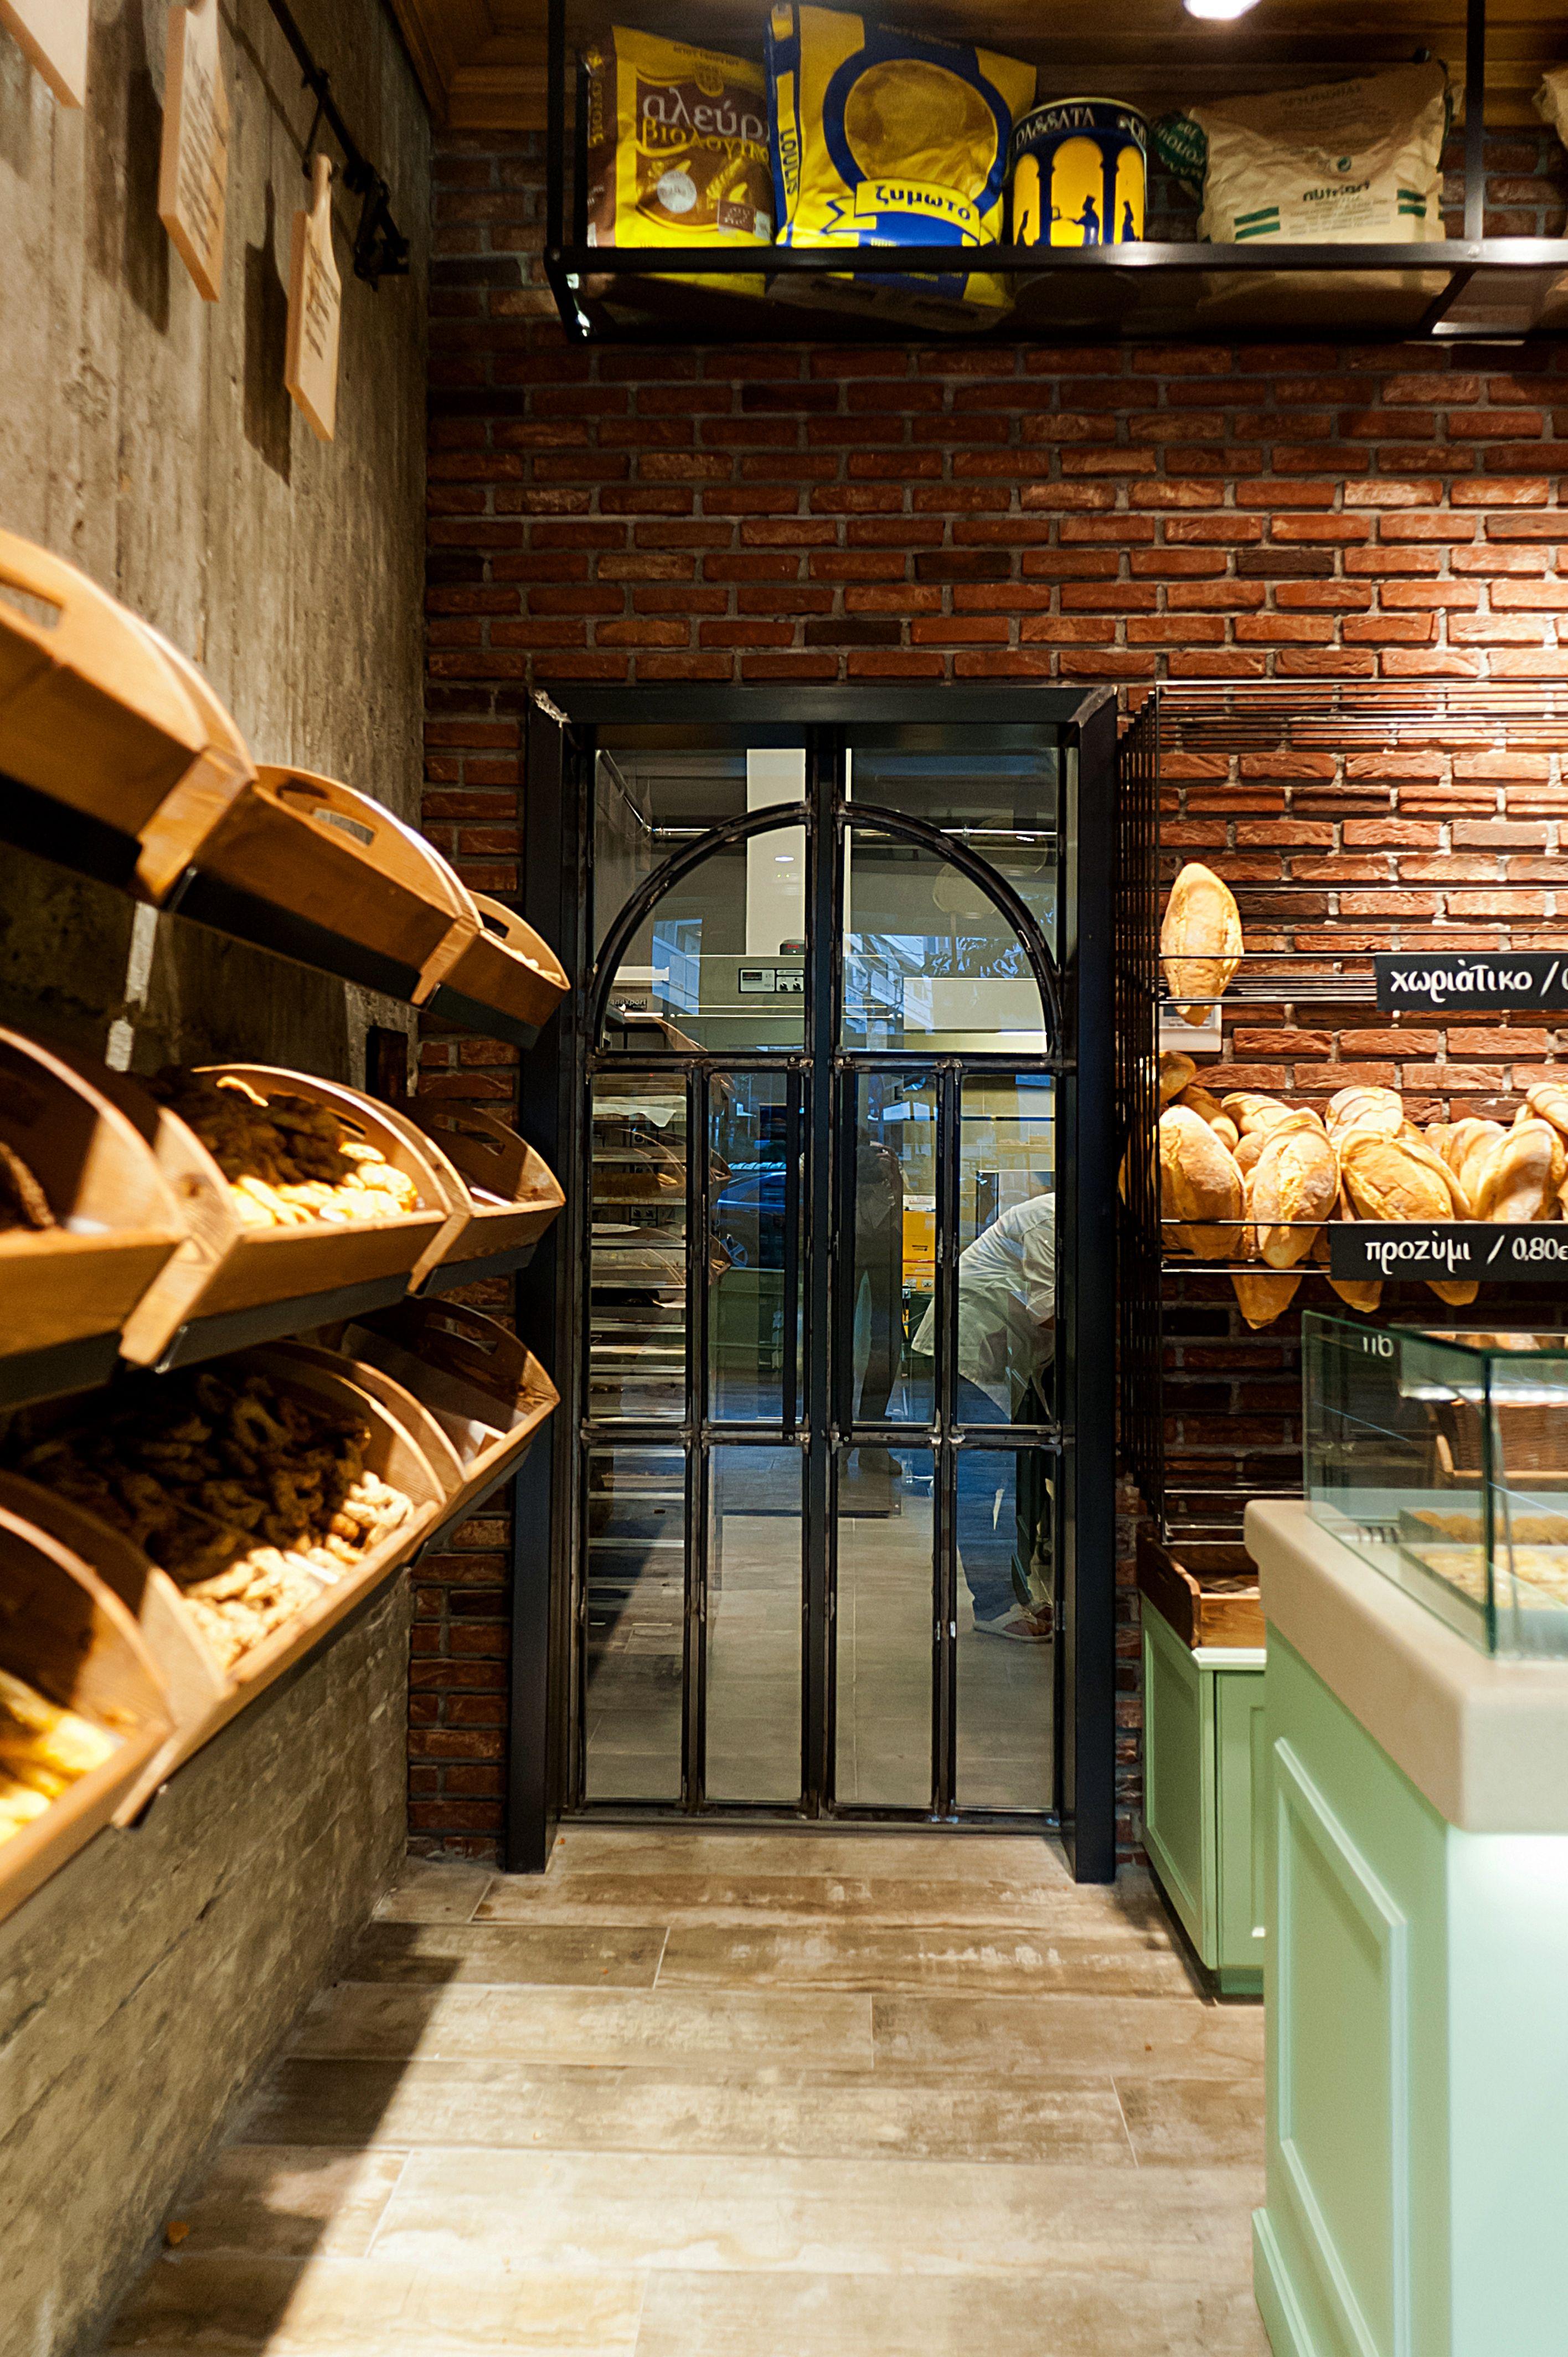 kogias'' bakery interior design constantinos bikas  bakery  - different angle on previously posted bakery design constantinos bikas interiordesigner  kogia bakery by konstantinos bikas via behance